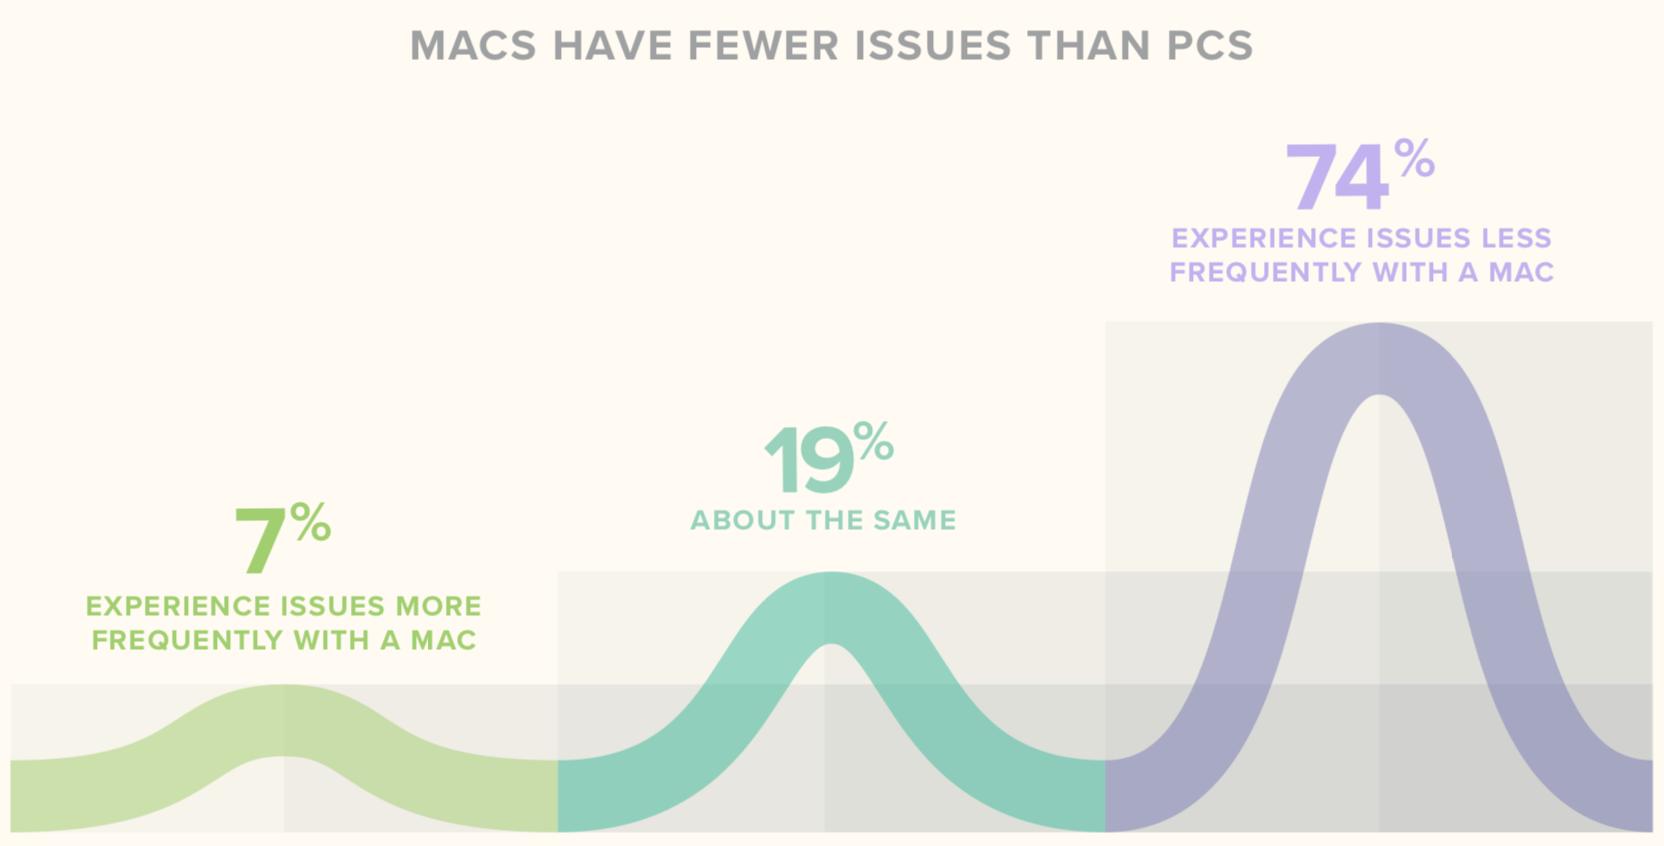 Search: Mac Vs. PC at work